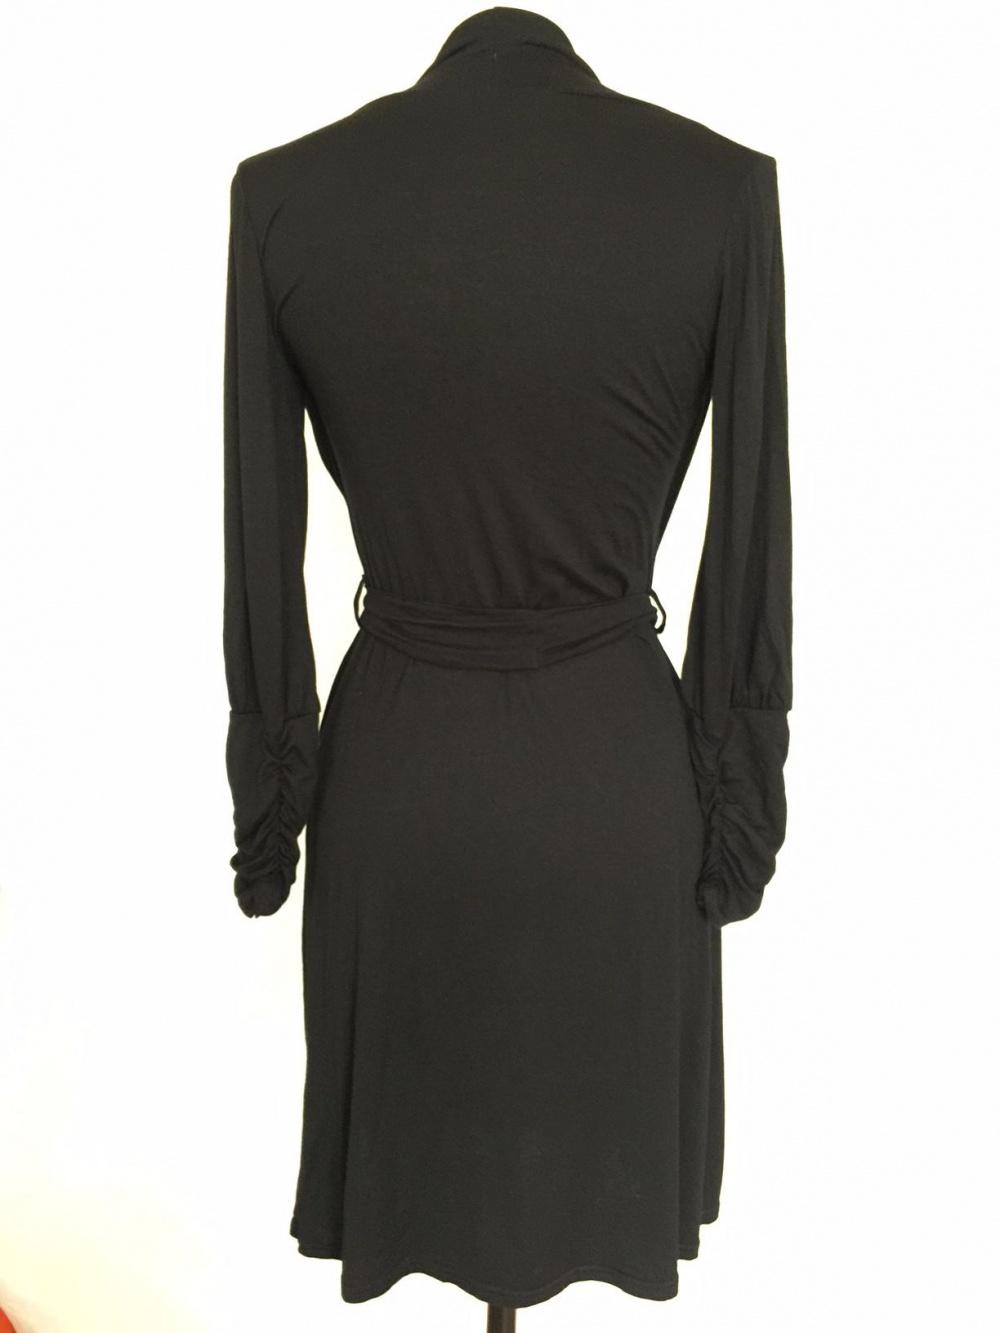 Черное французское трикотажное платье марка Malle Demoiselle  размер 42-44